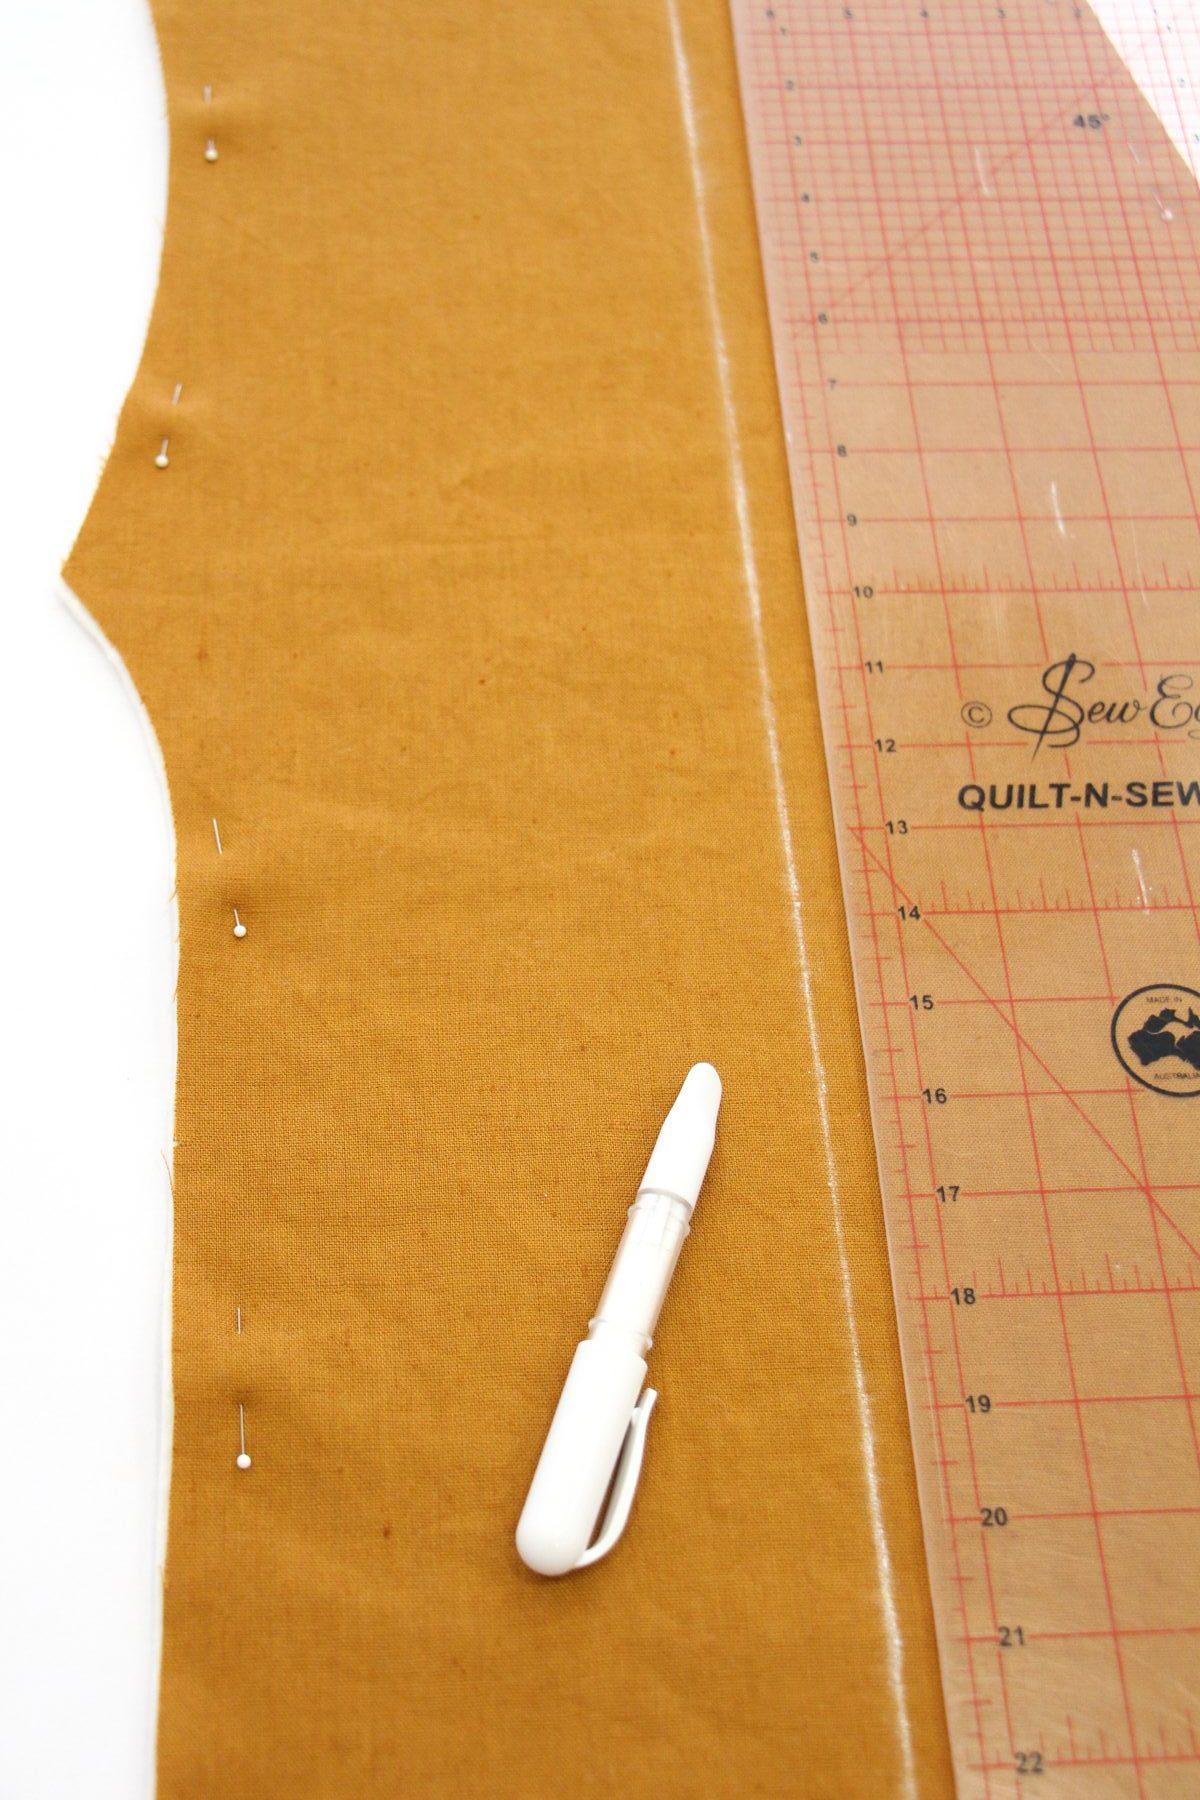 Megan Nielsen Patterns | Hovea Sewalong: Quilting Prep | Marking Your Grainline With Chalk